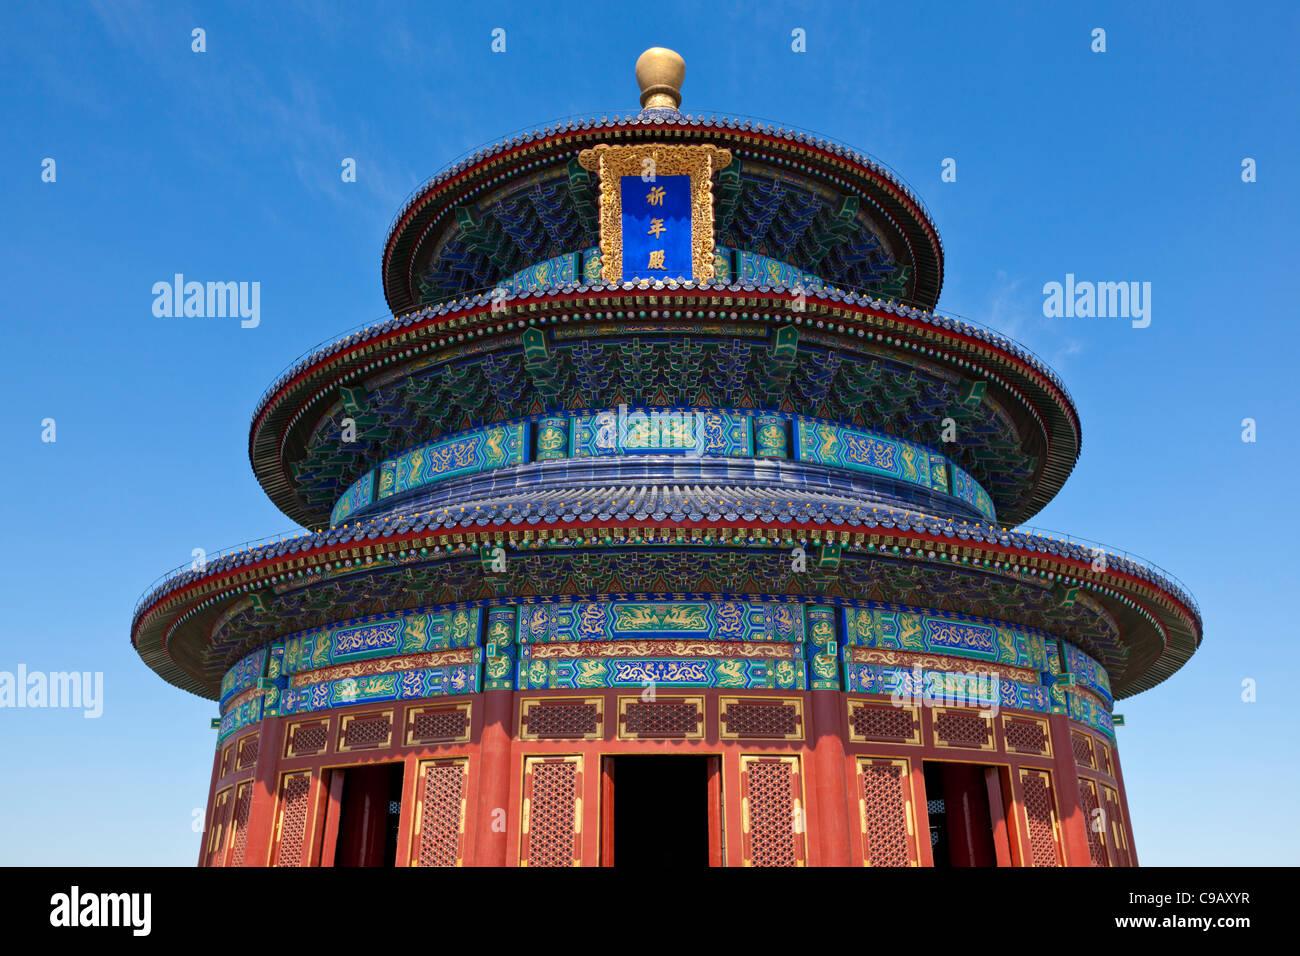 Tian Tan, Temple of Heaven, Qinian Dian temple, Beijing, PRC, People's Republic of China, Asia - Stock Image